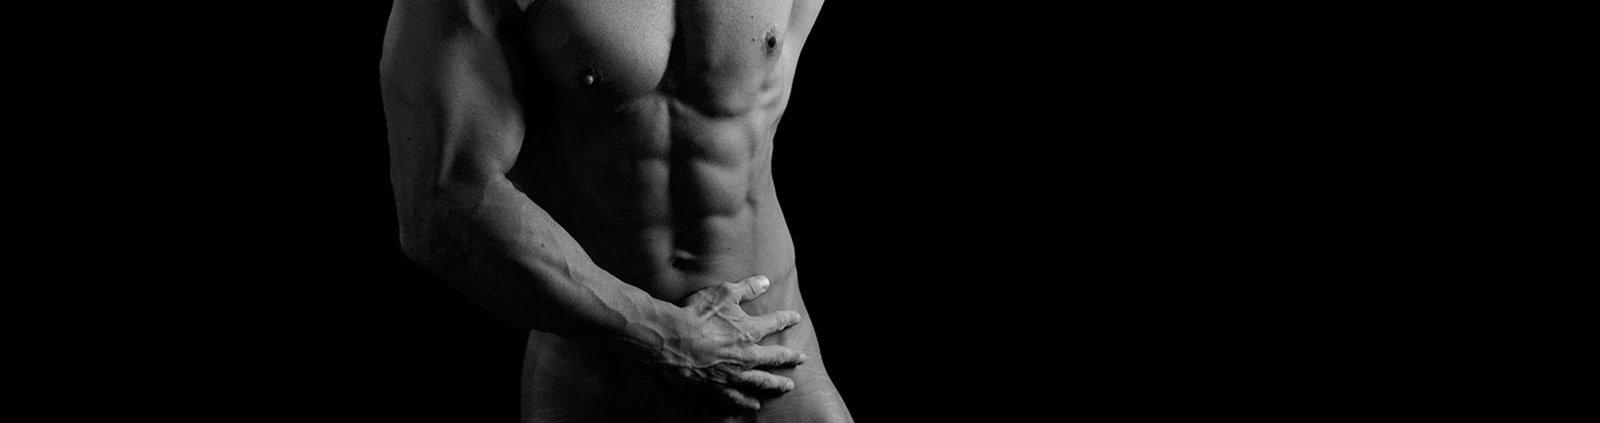 Full-body privé massage voor hem